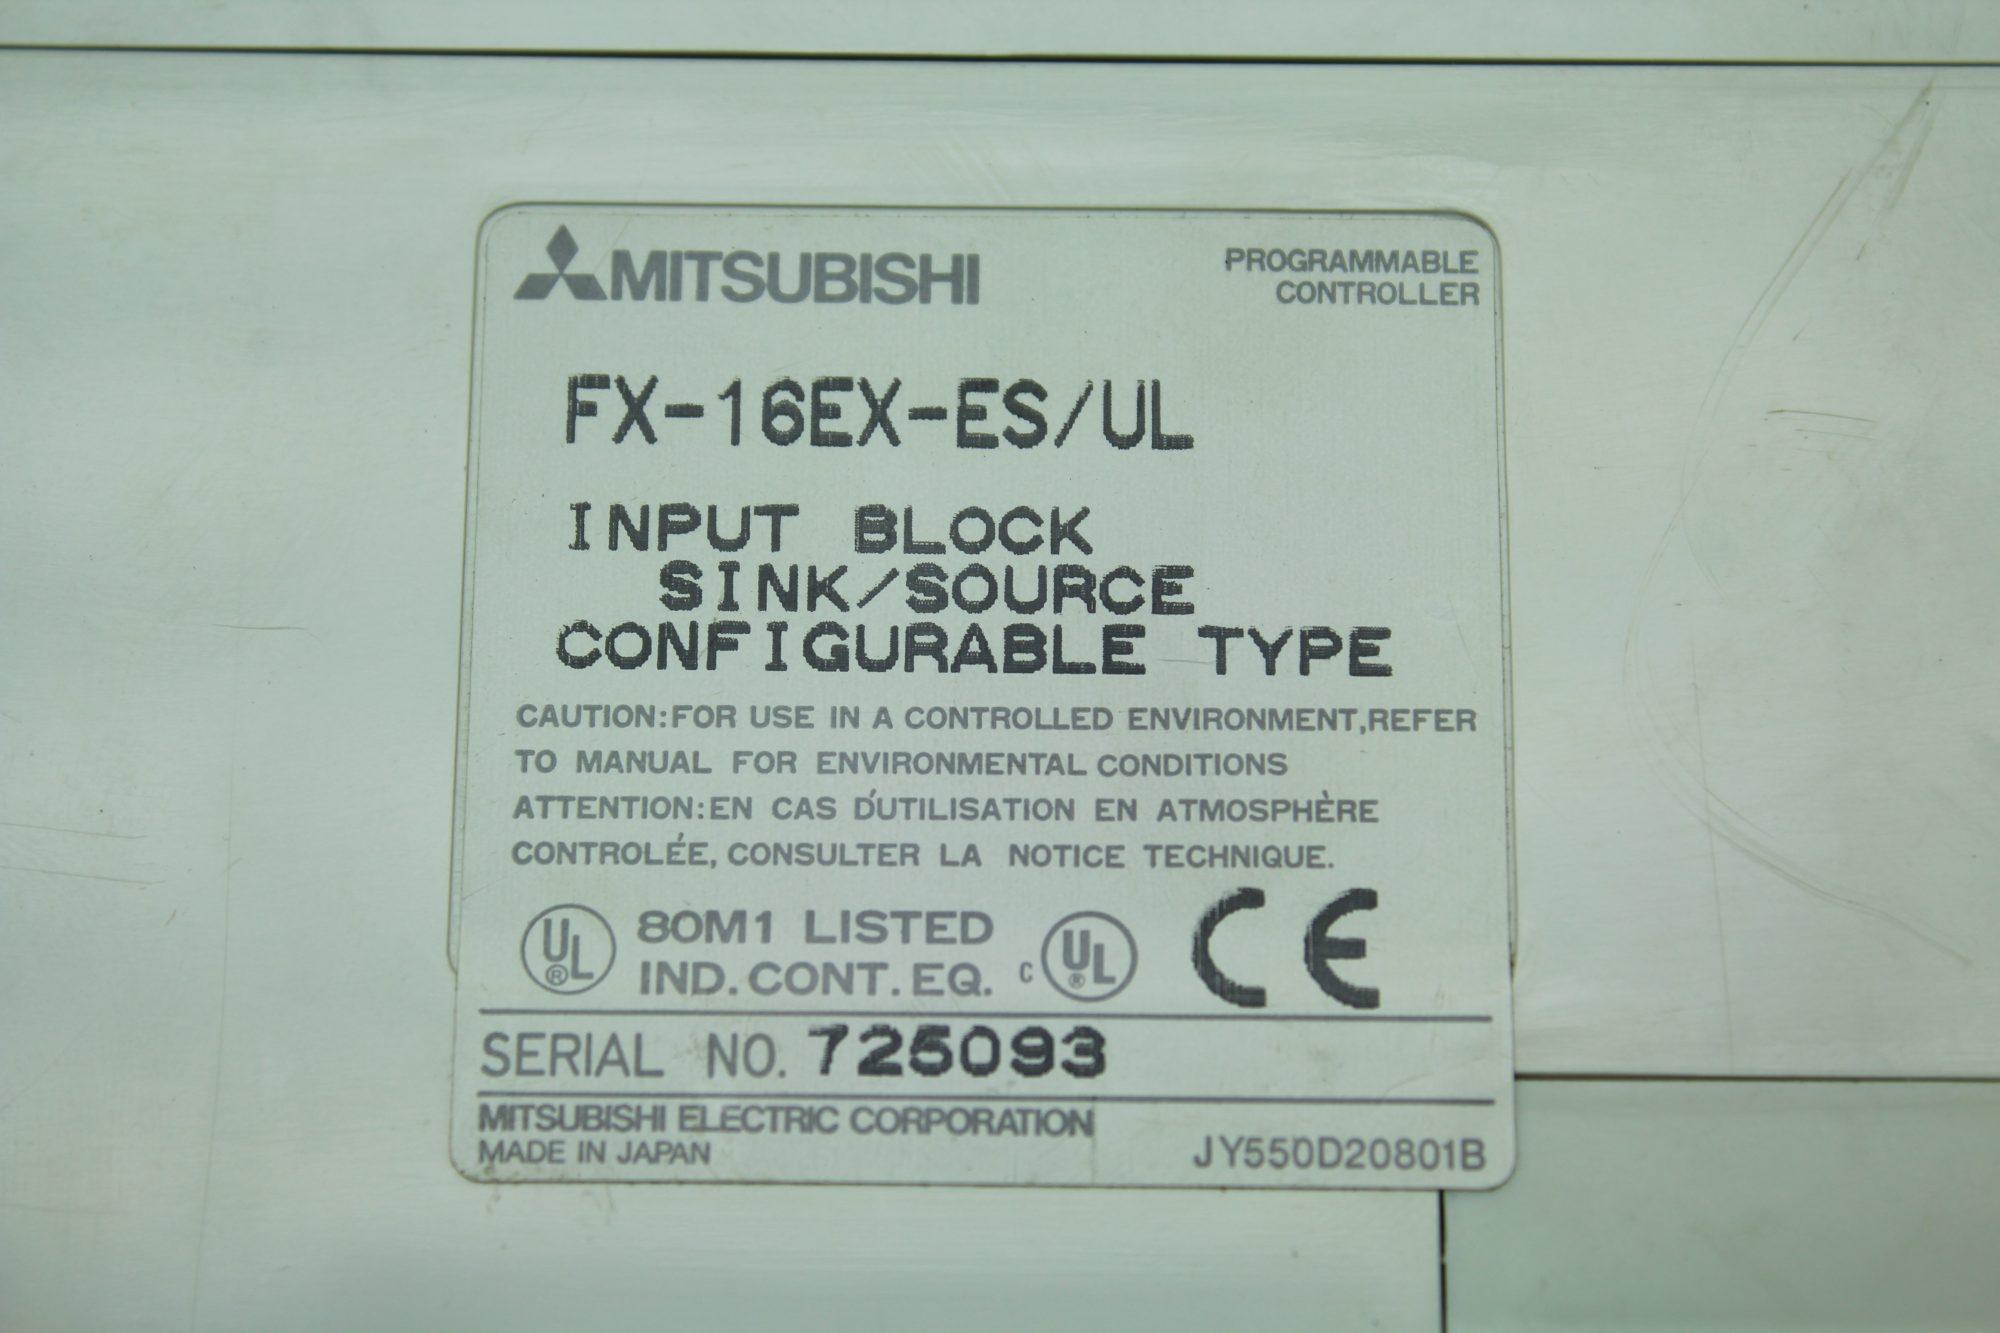 Mitsubishi FX-16EX-ES/UL PLC Input Block